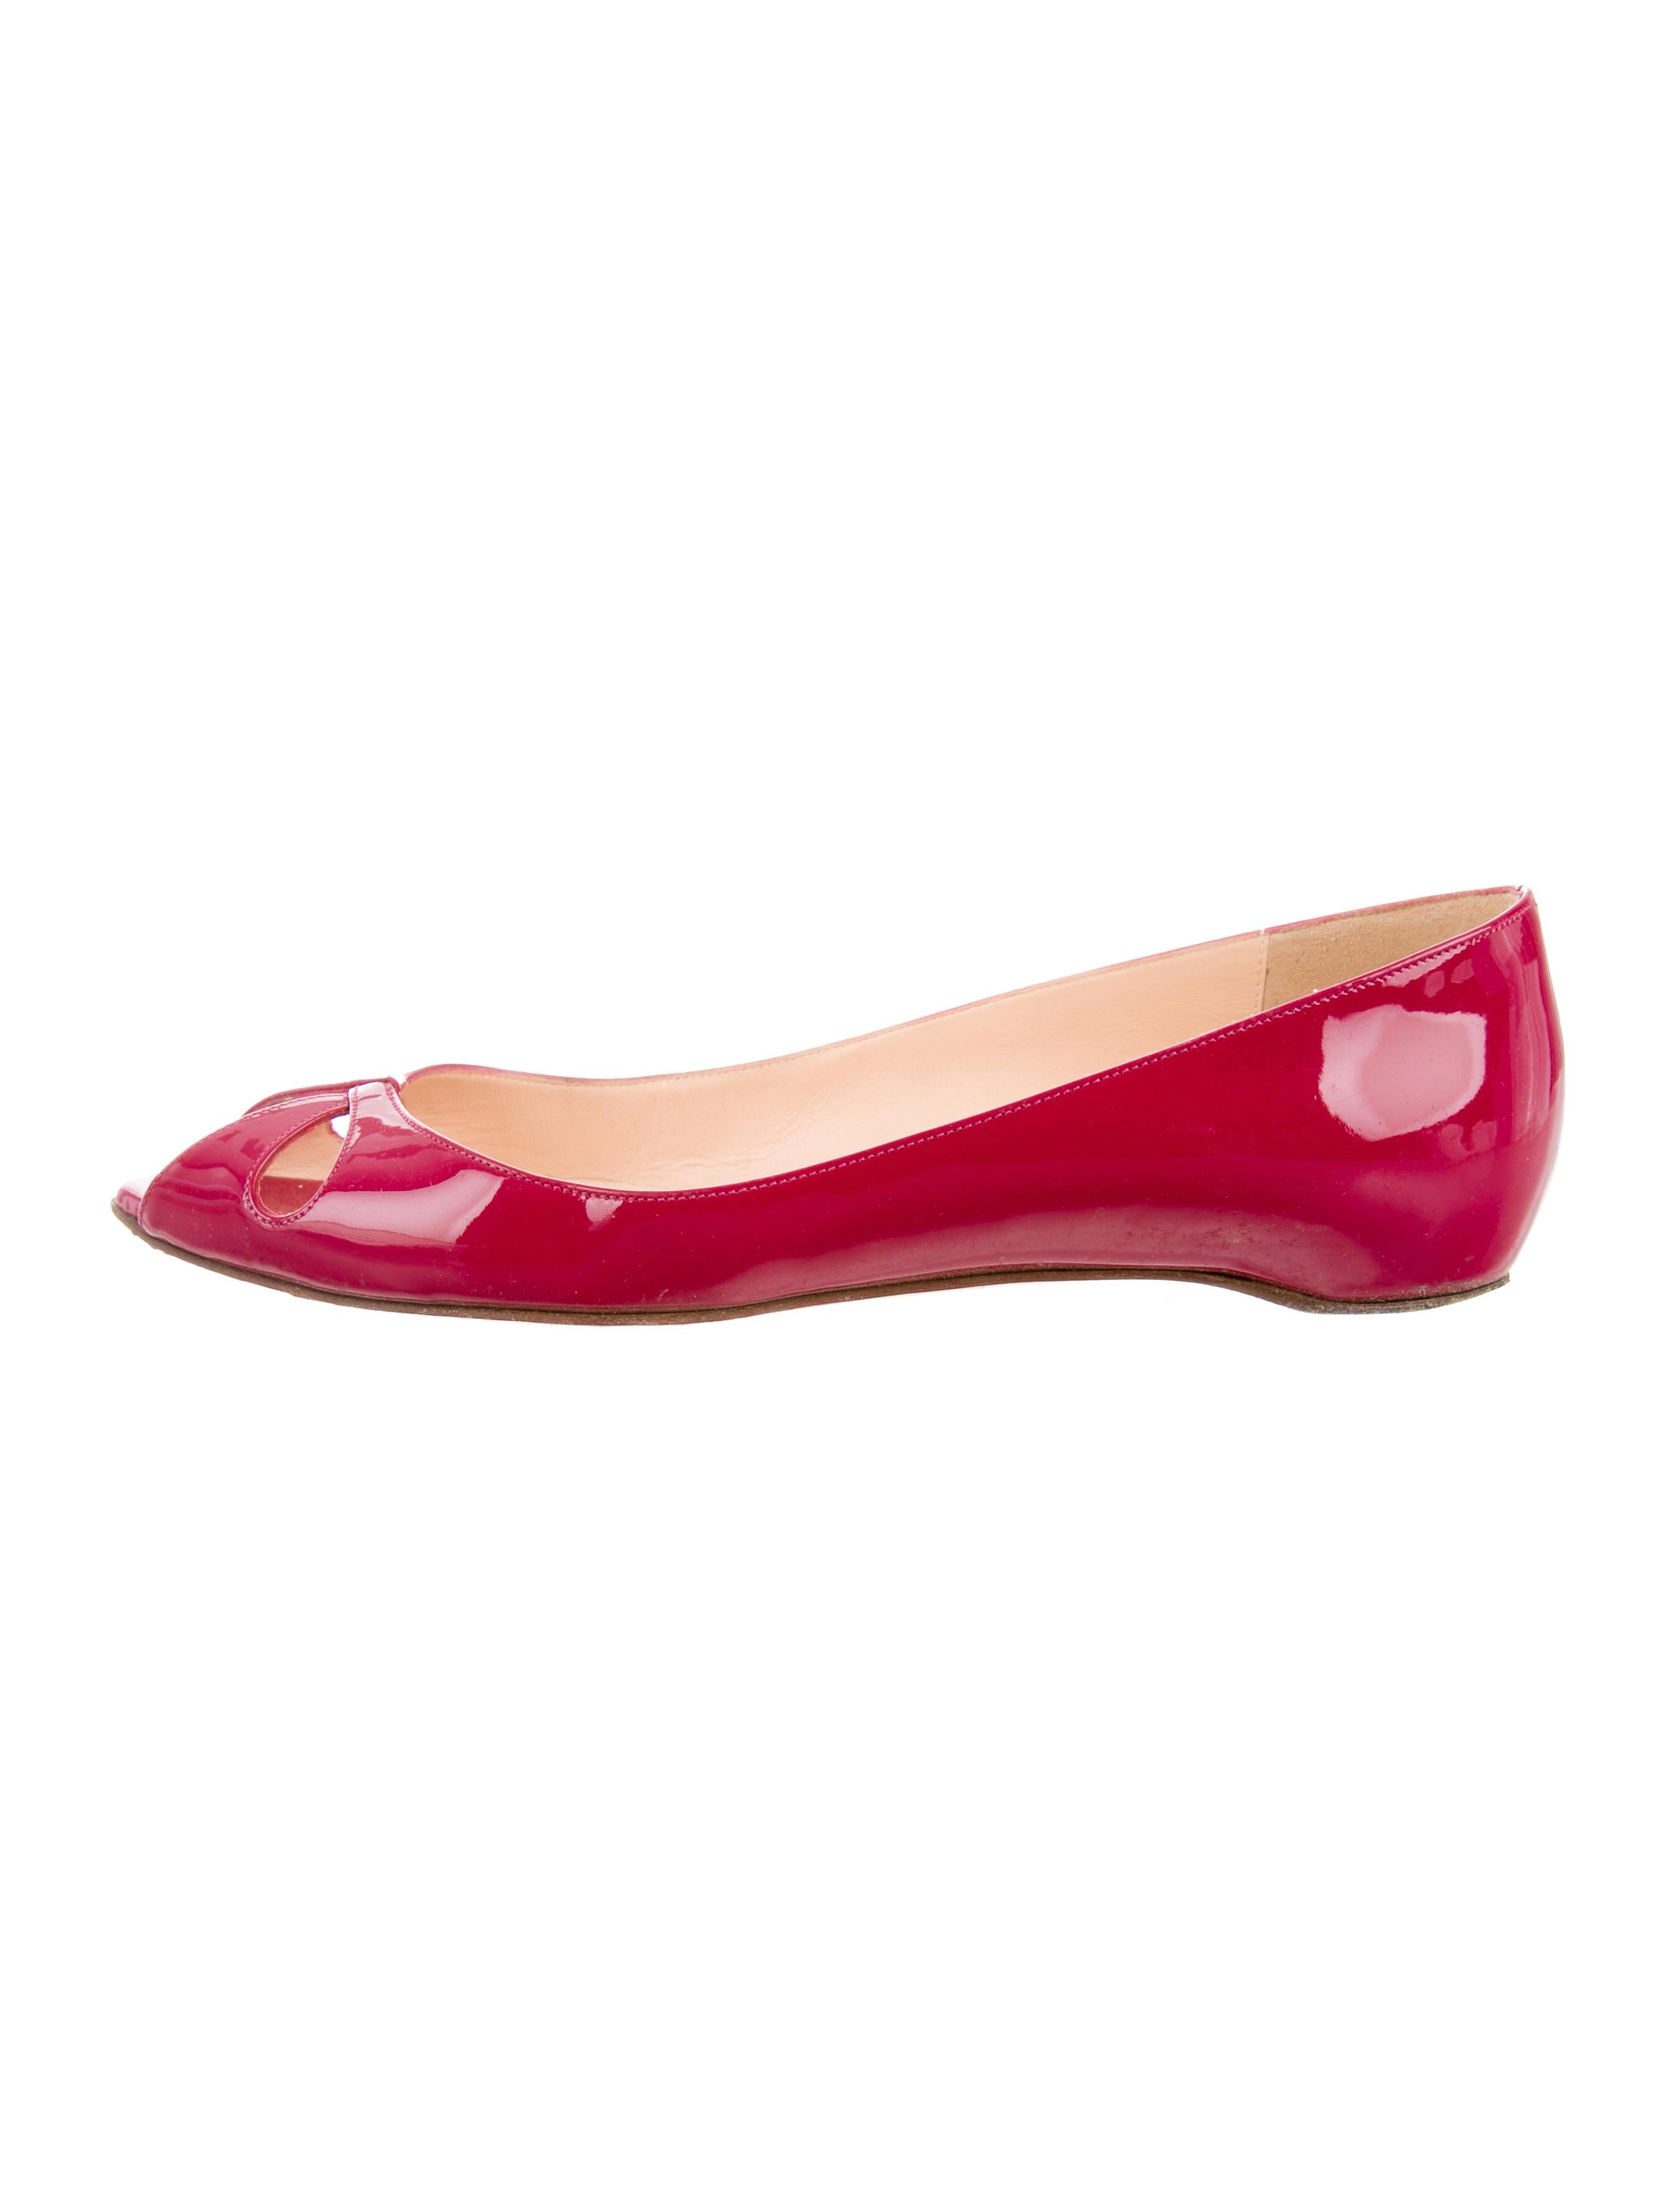 12ce6ffe7a5c Christian Louboutin Teresa Patent Leather Flats - Shoes - CHT97177 ...